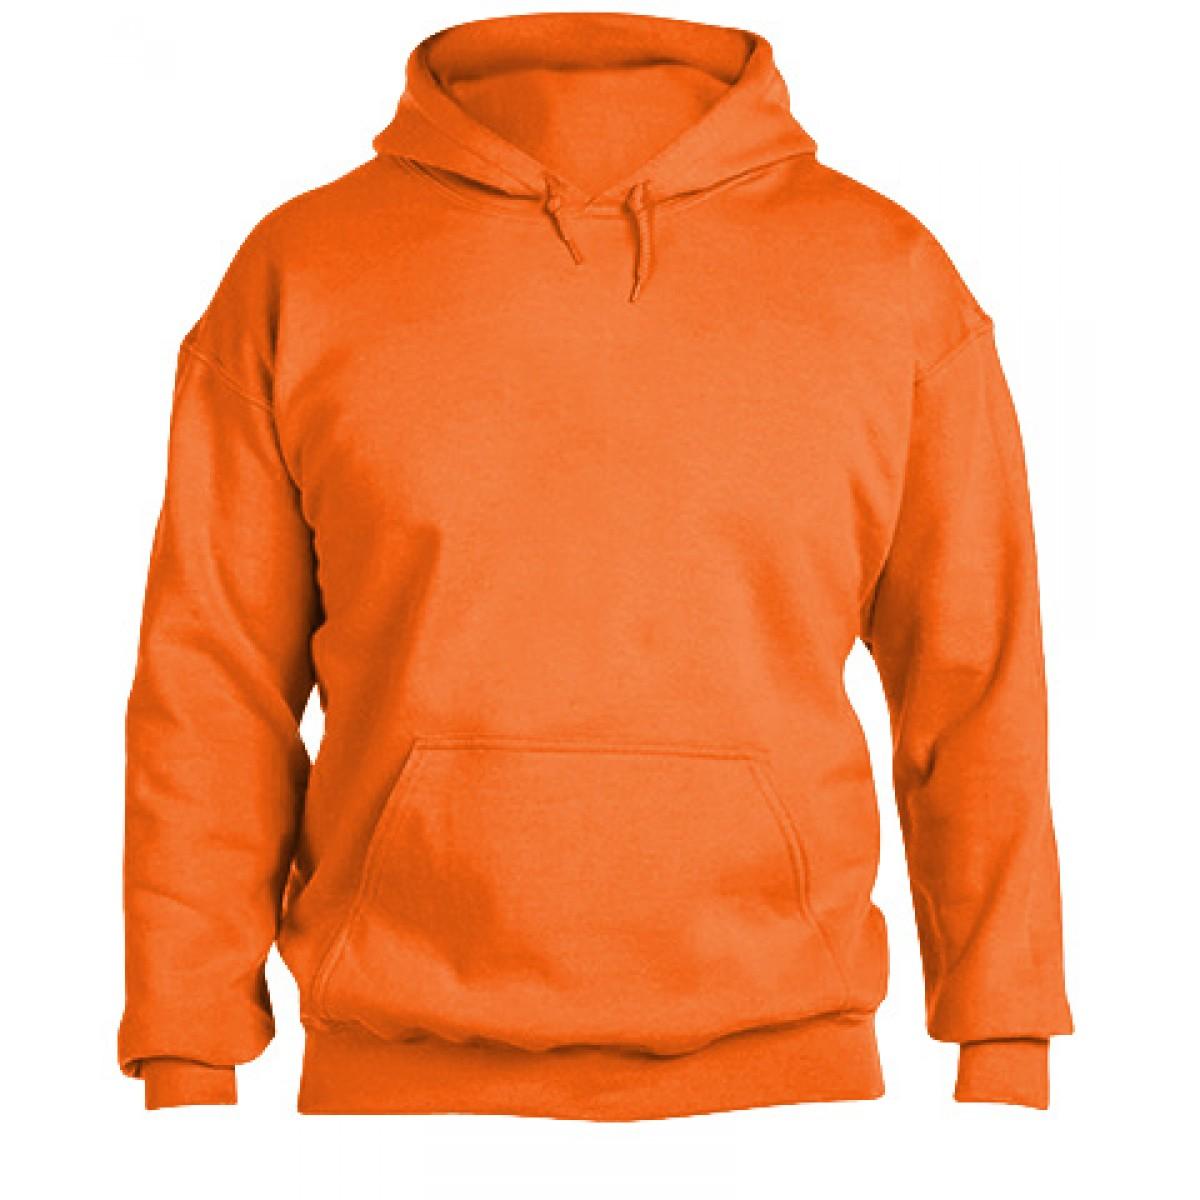 Solid Hooded Sweatshirt  50/50 Heavy Blend-Safety Orange-L